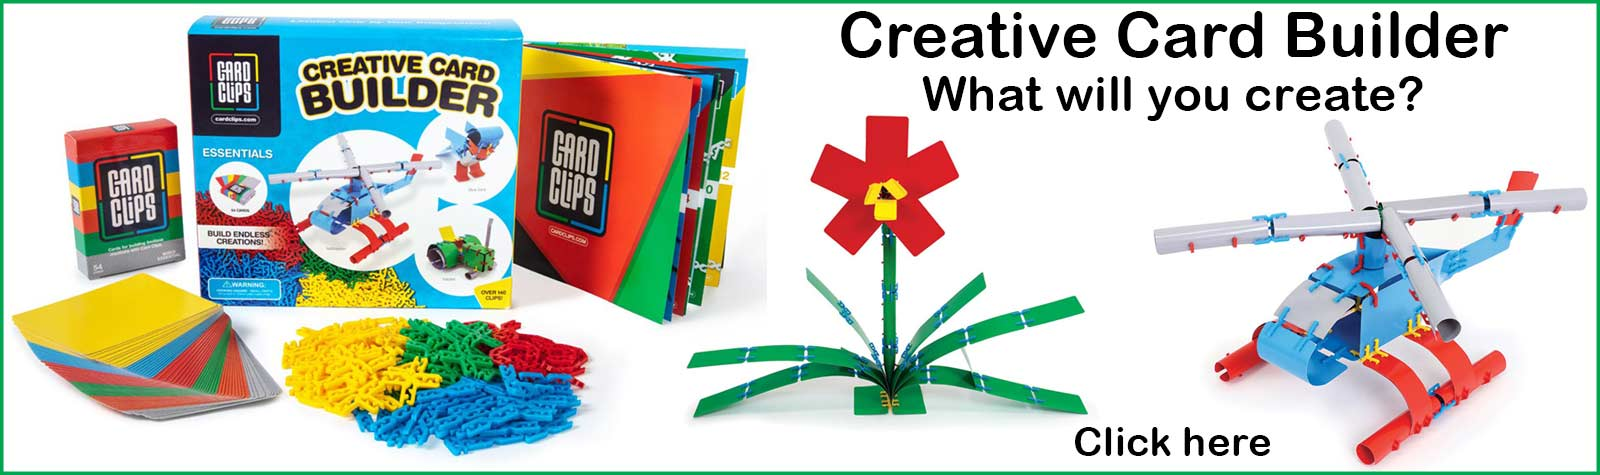 Creative Card Builder